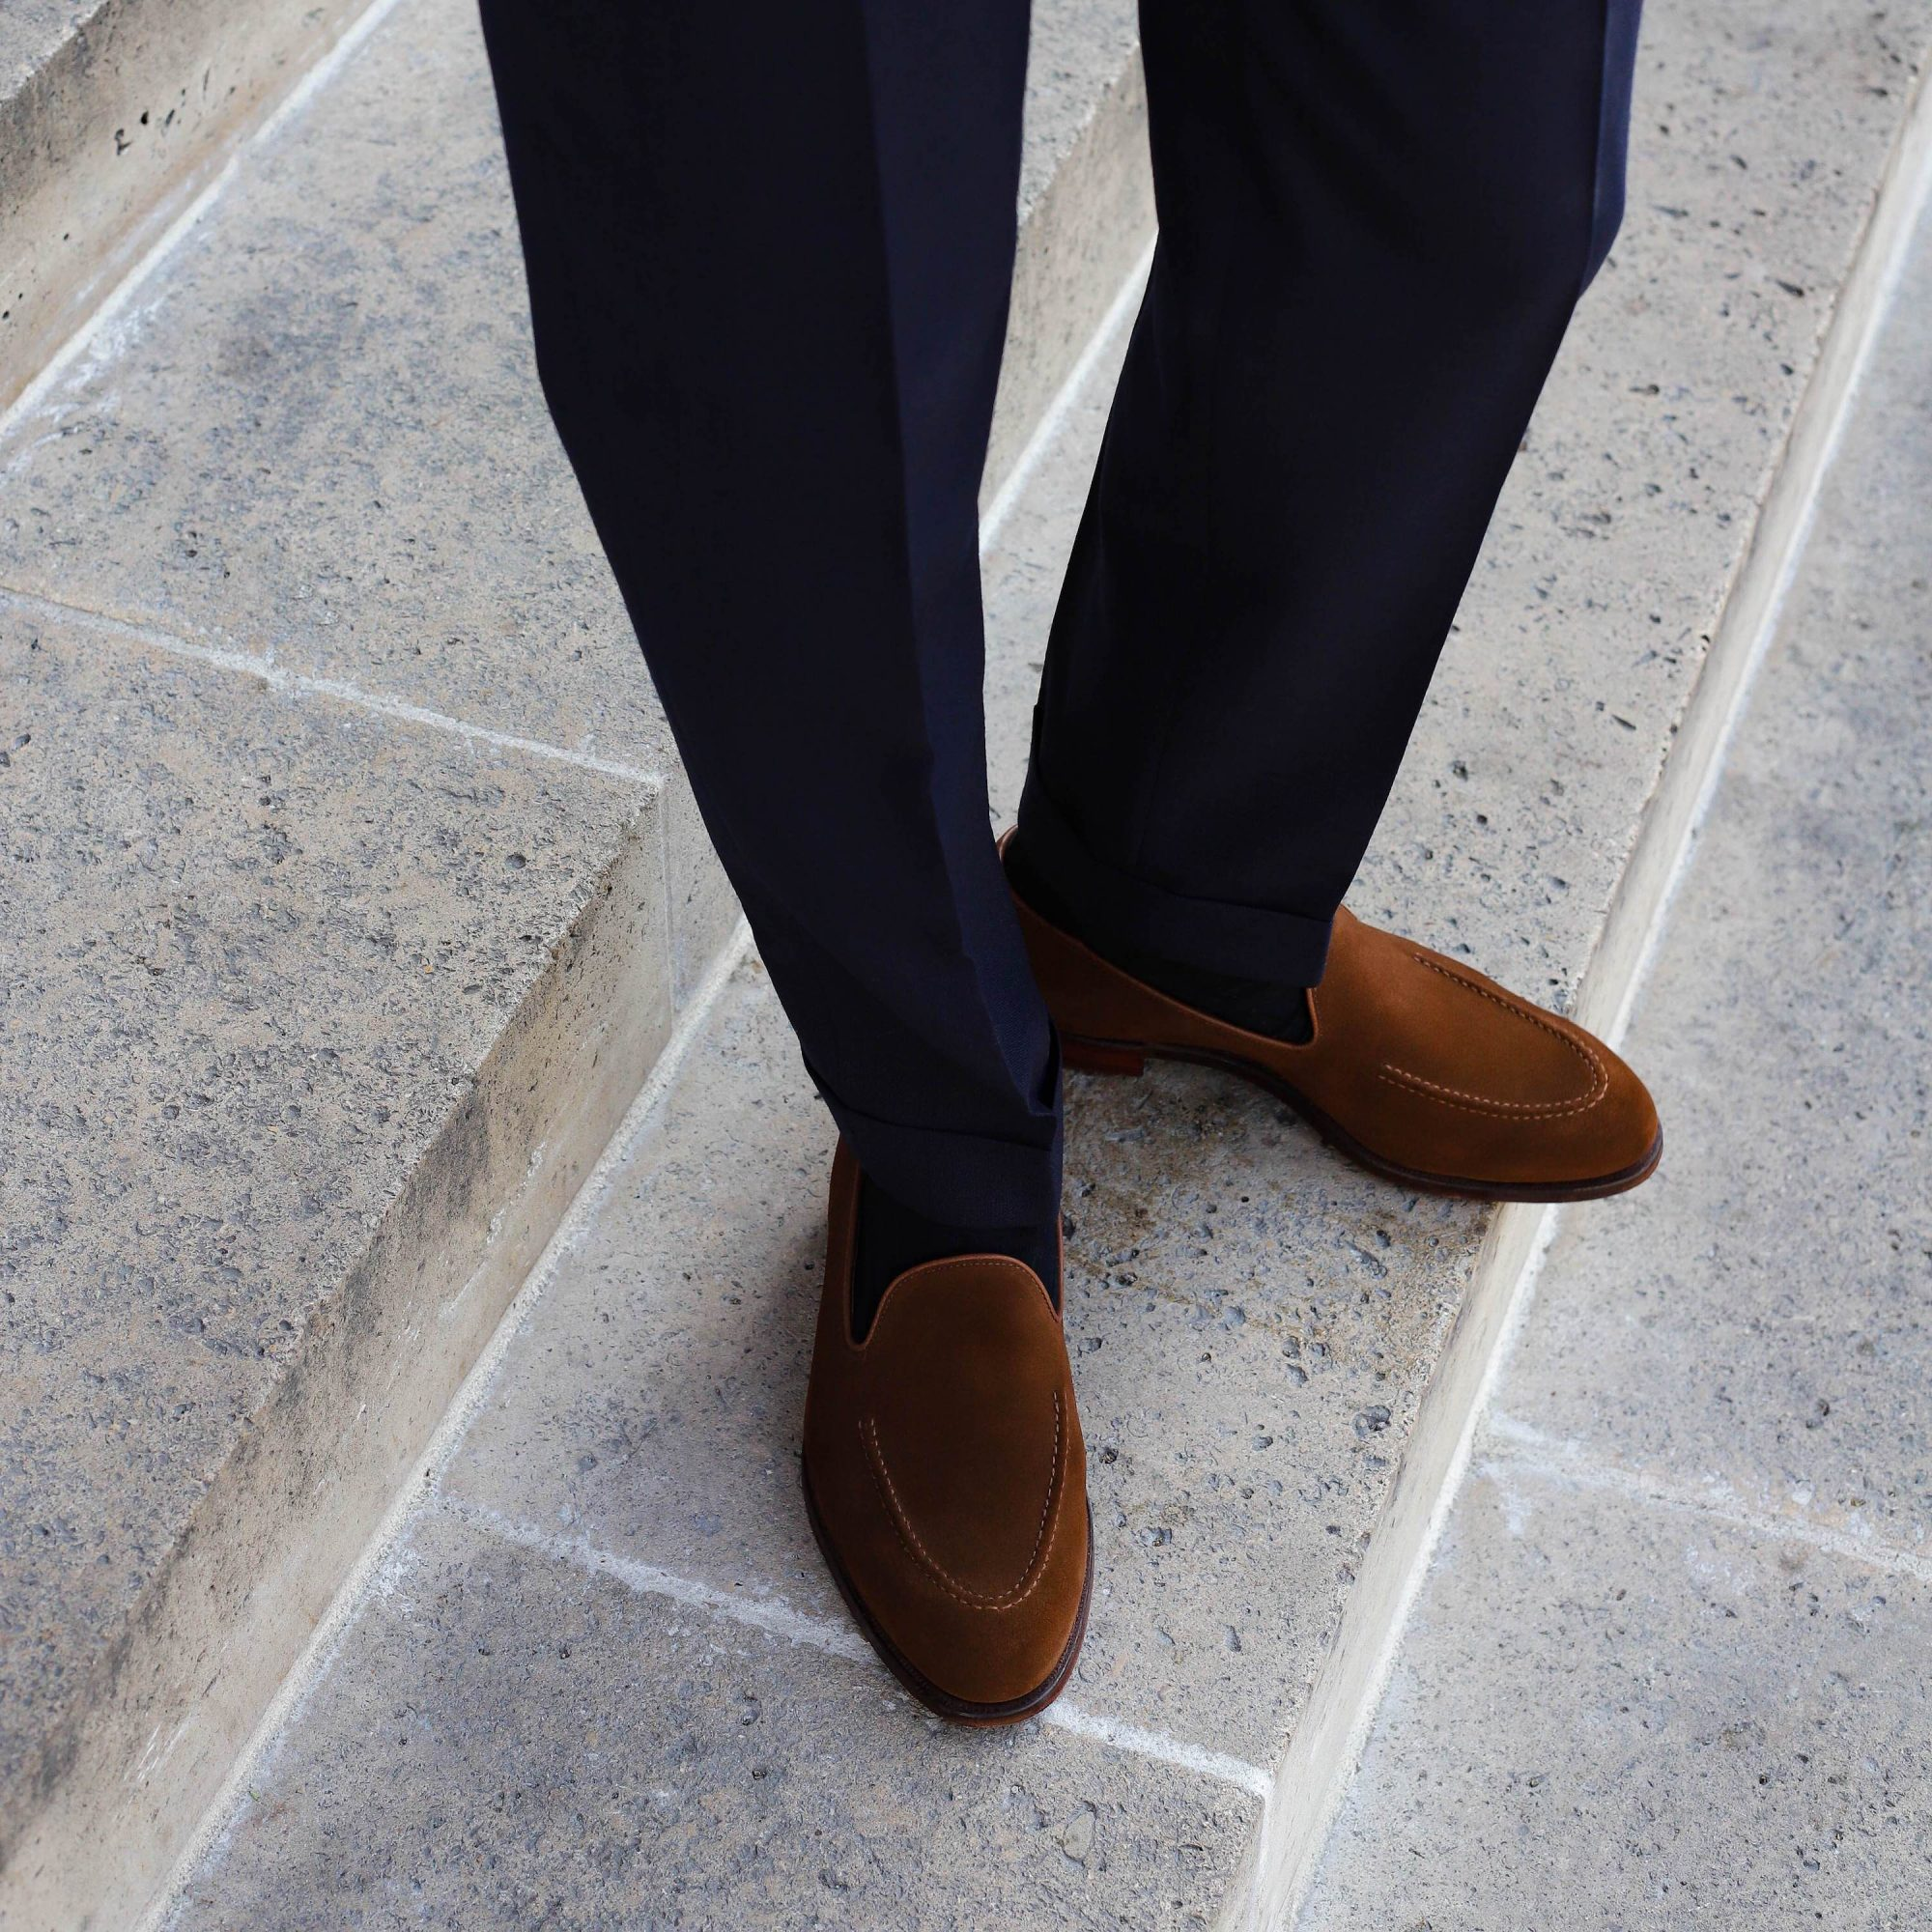 Tasselless loafer crockett and jones